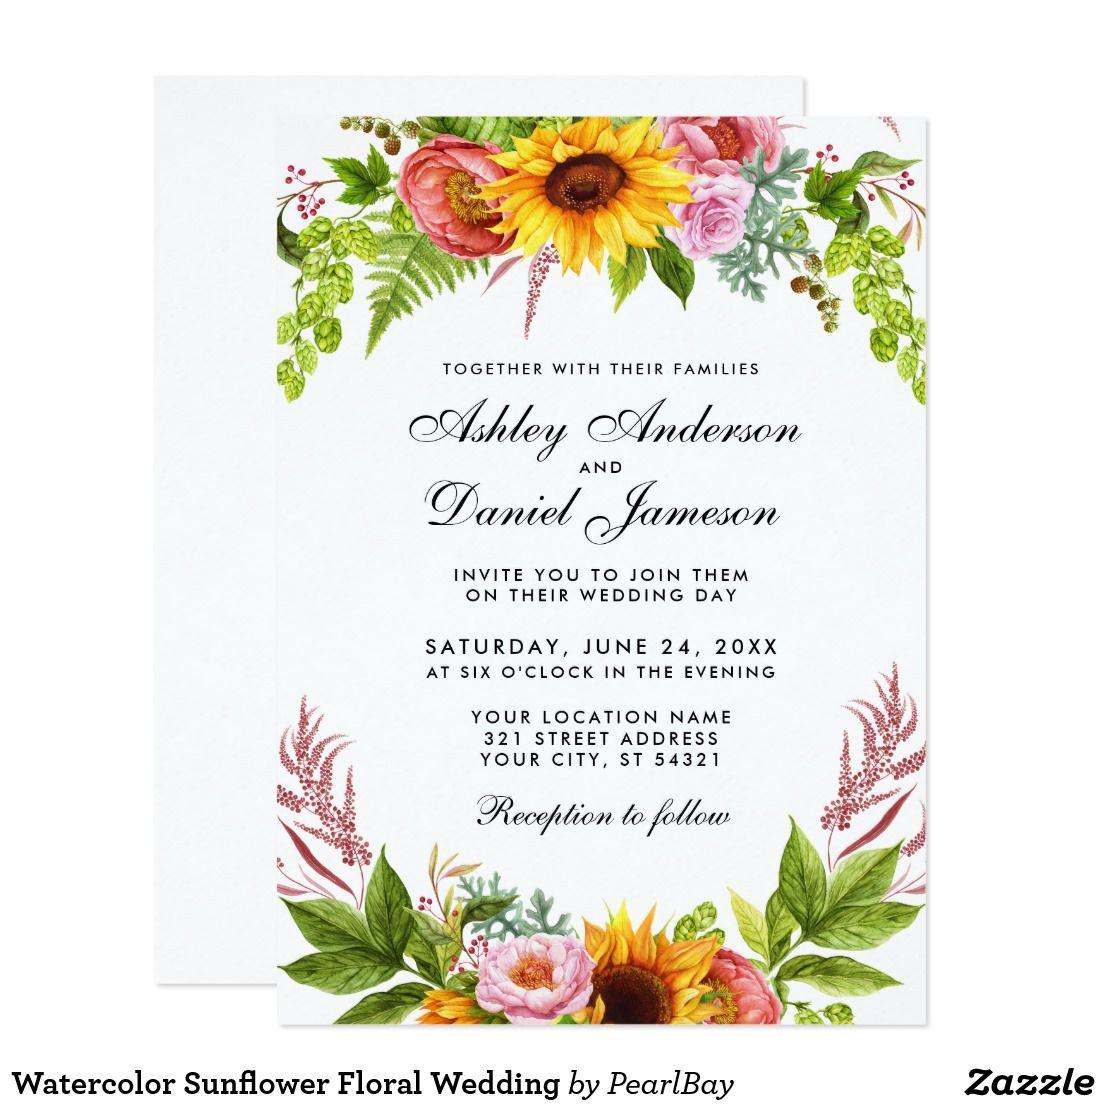 Watercolor Sunflower Floral Wedding Invitation Zazzle